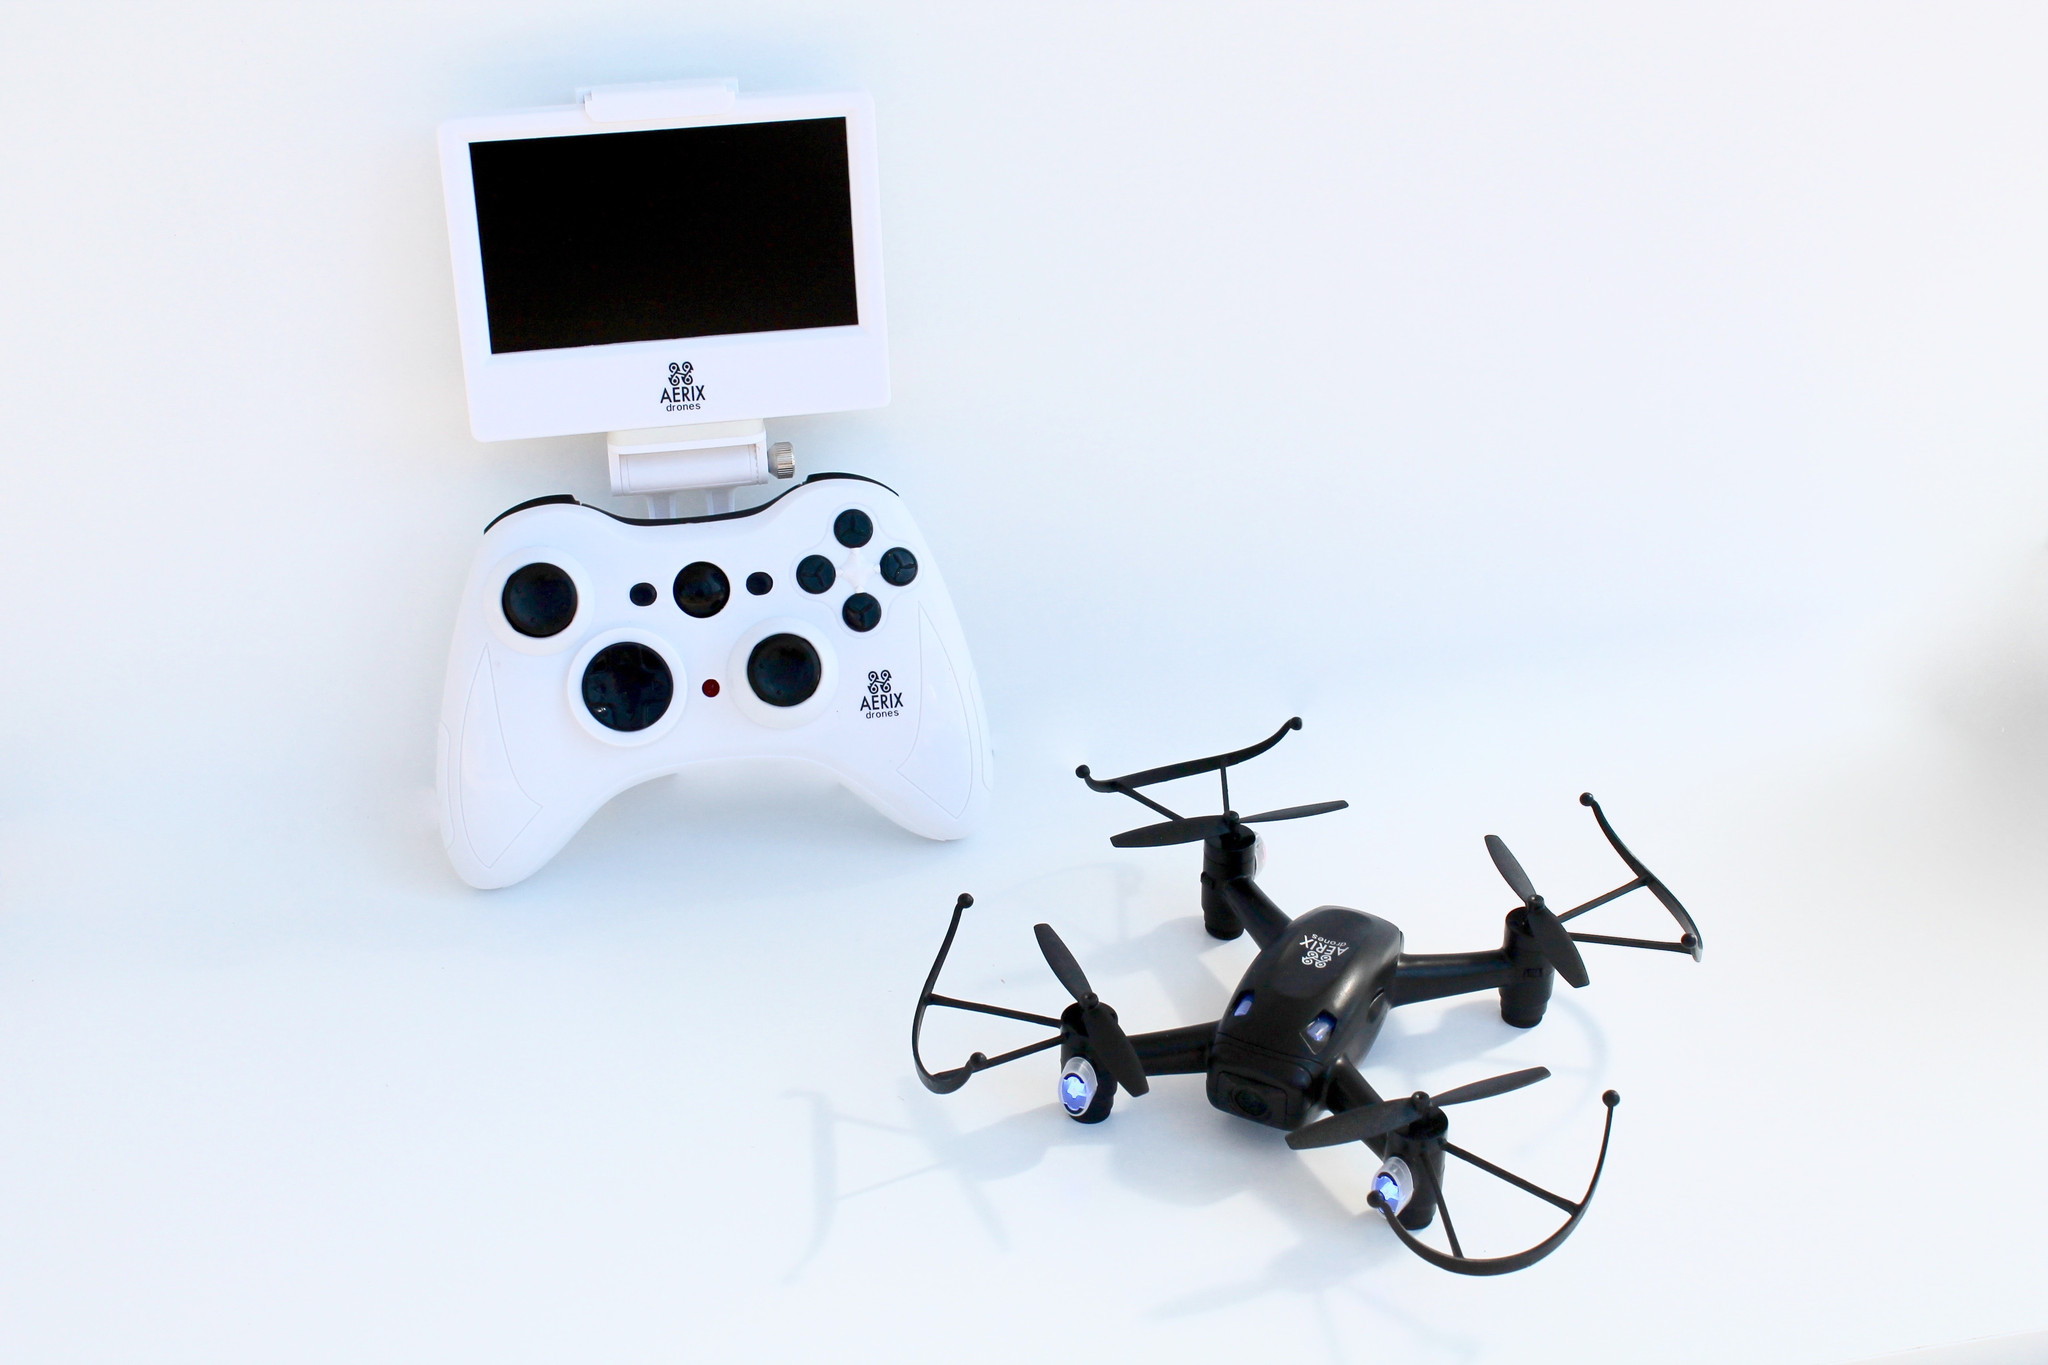 The Best Cheap Drones - Black Talon - Micro FPV Beginner Racing Drone